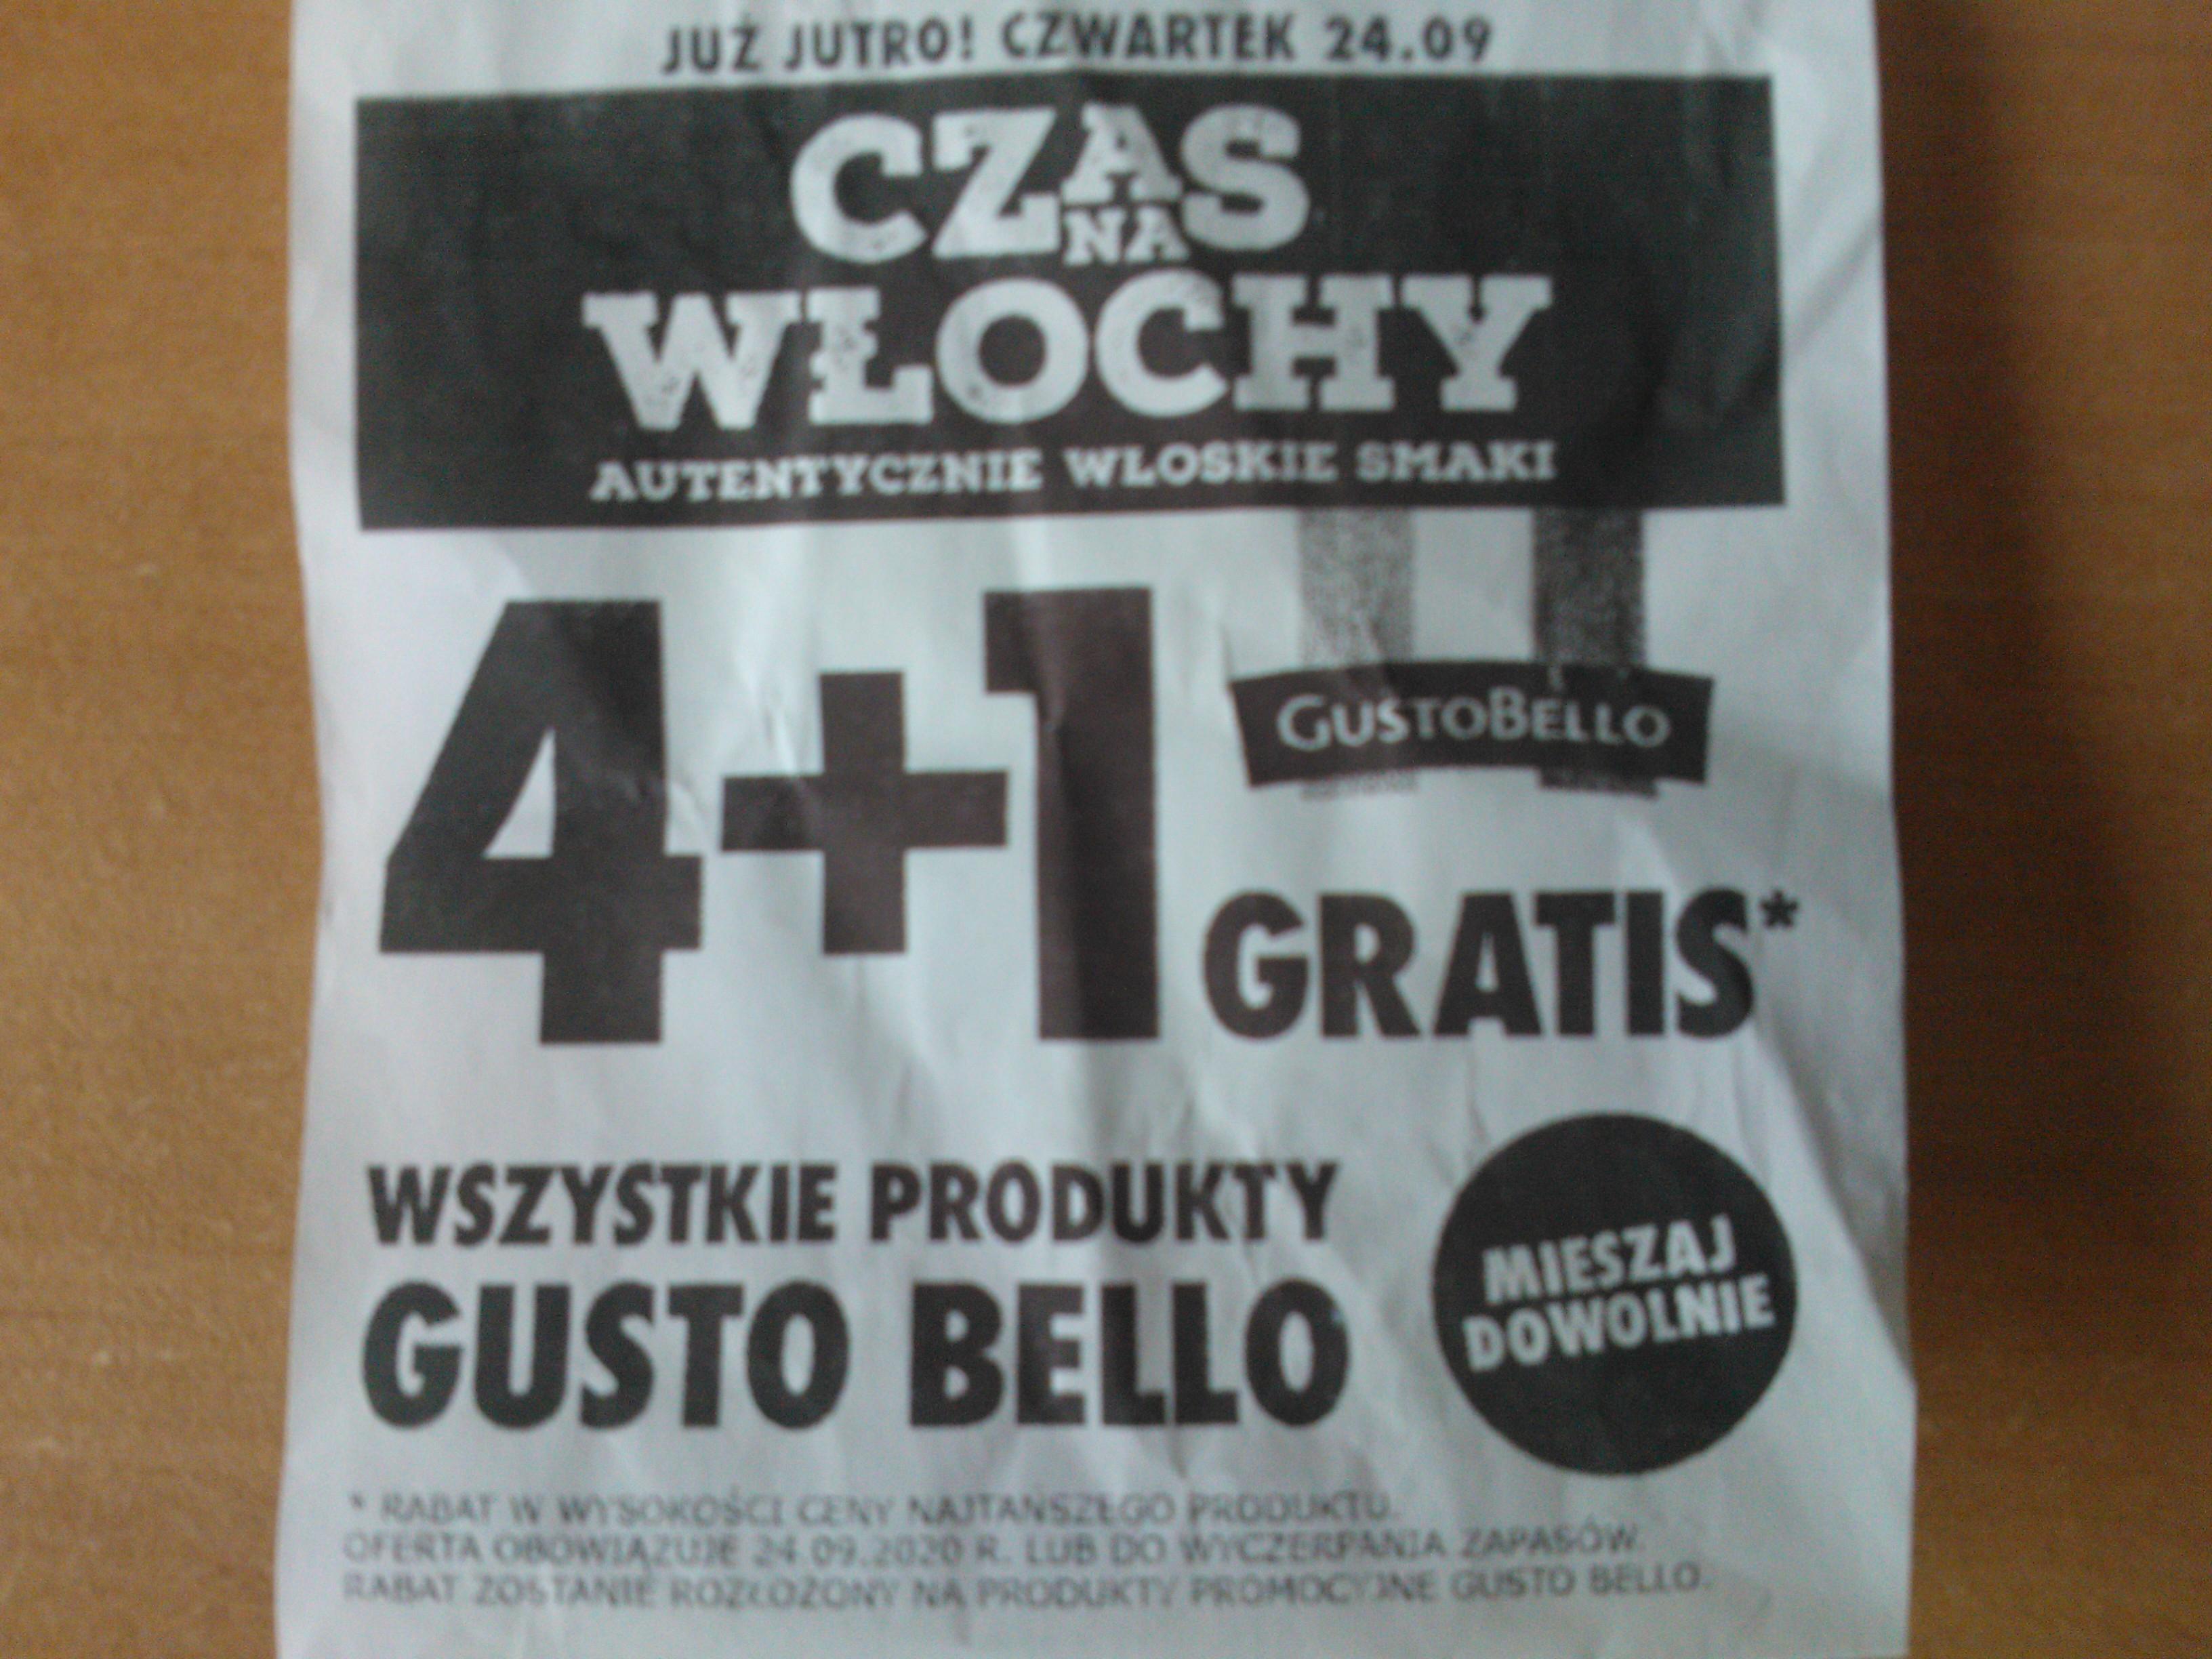 gusto bello 4+1 gratis np. Gorgonzola 150g 3,99zł Biedronka